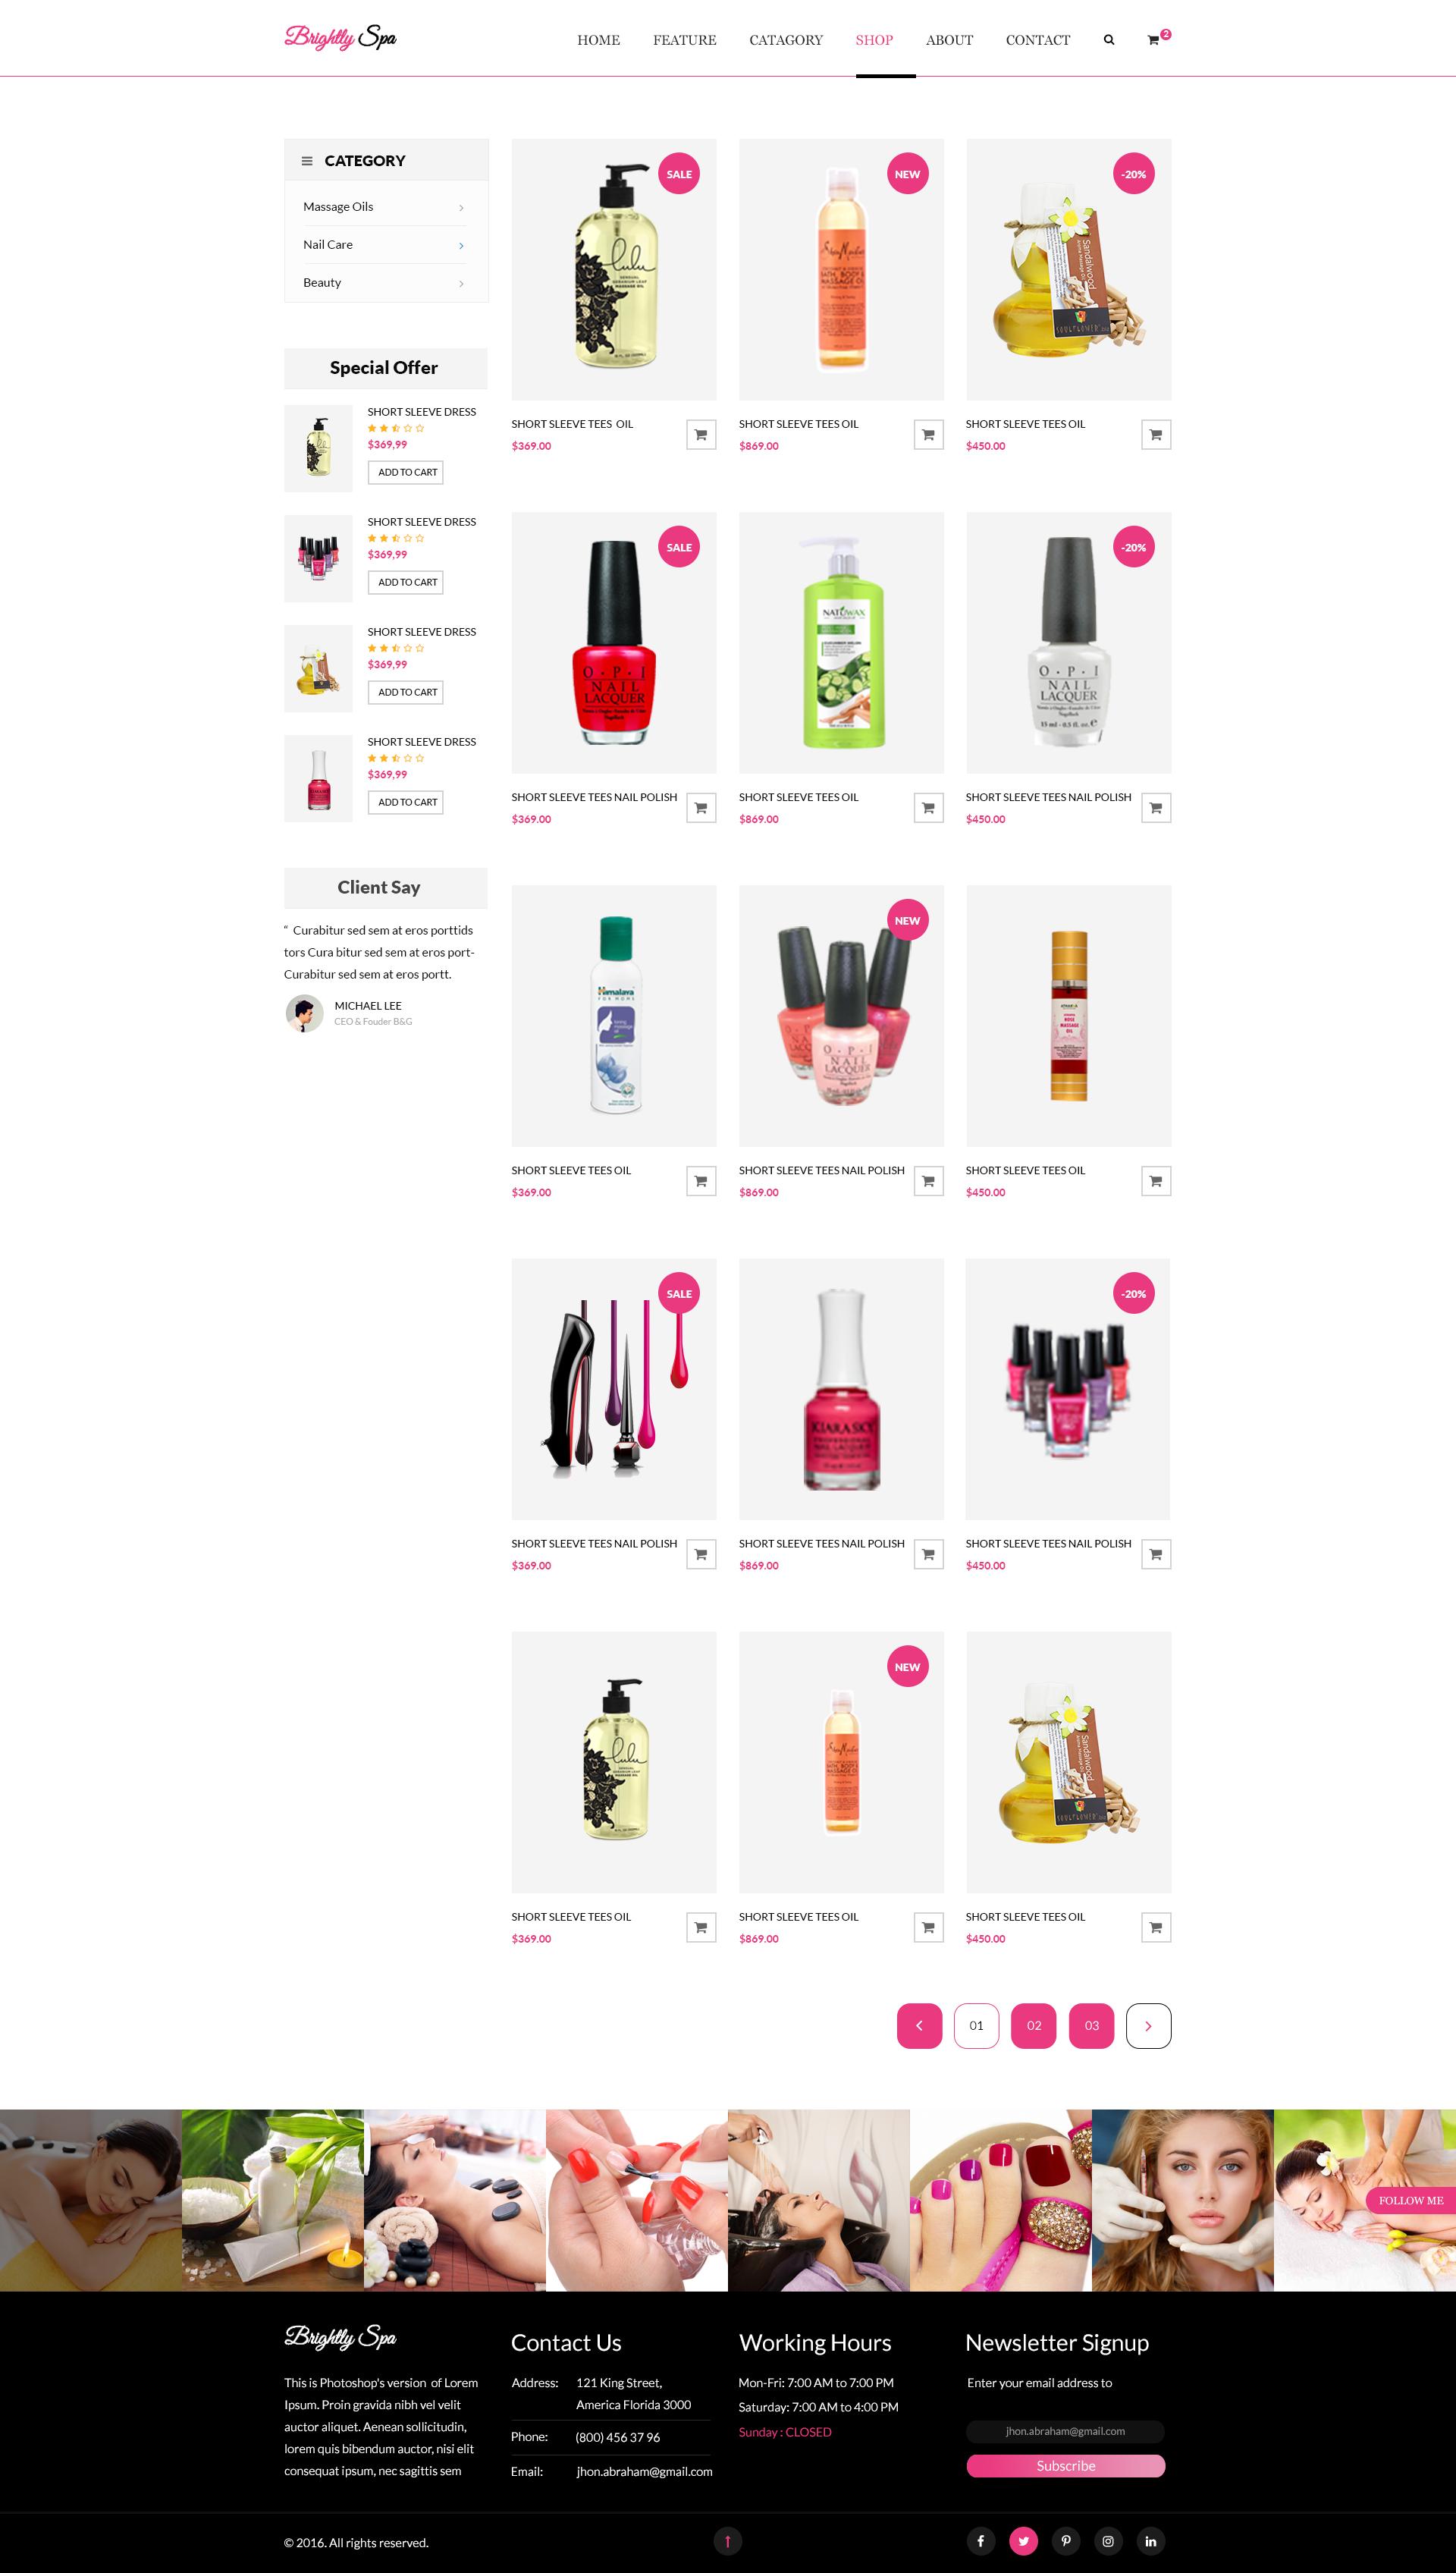 Brightly Spa Beauty Blog Psd Template By Blogfair